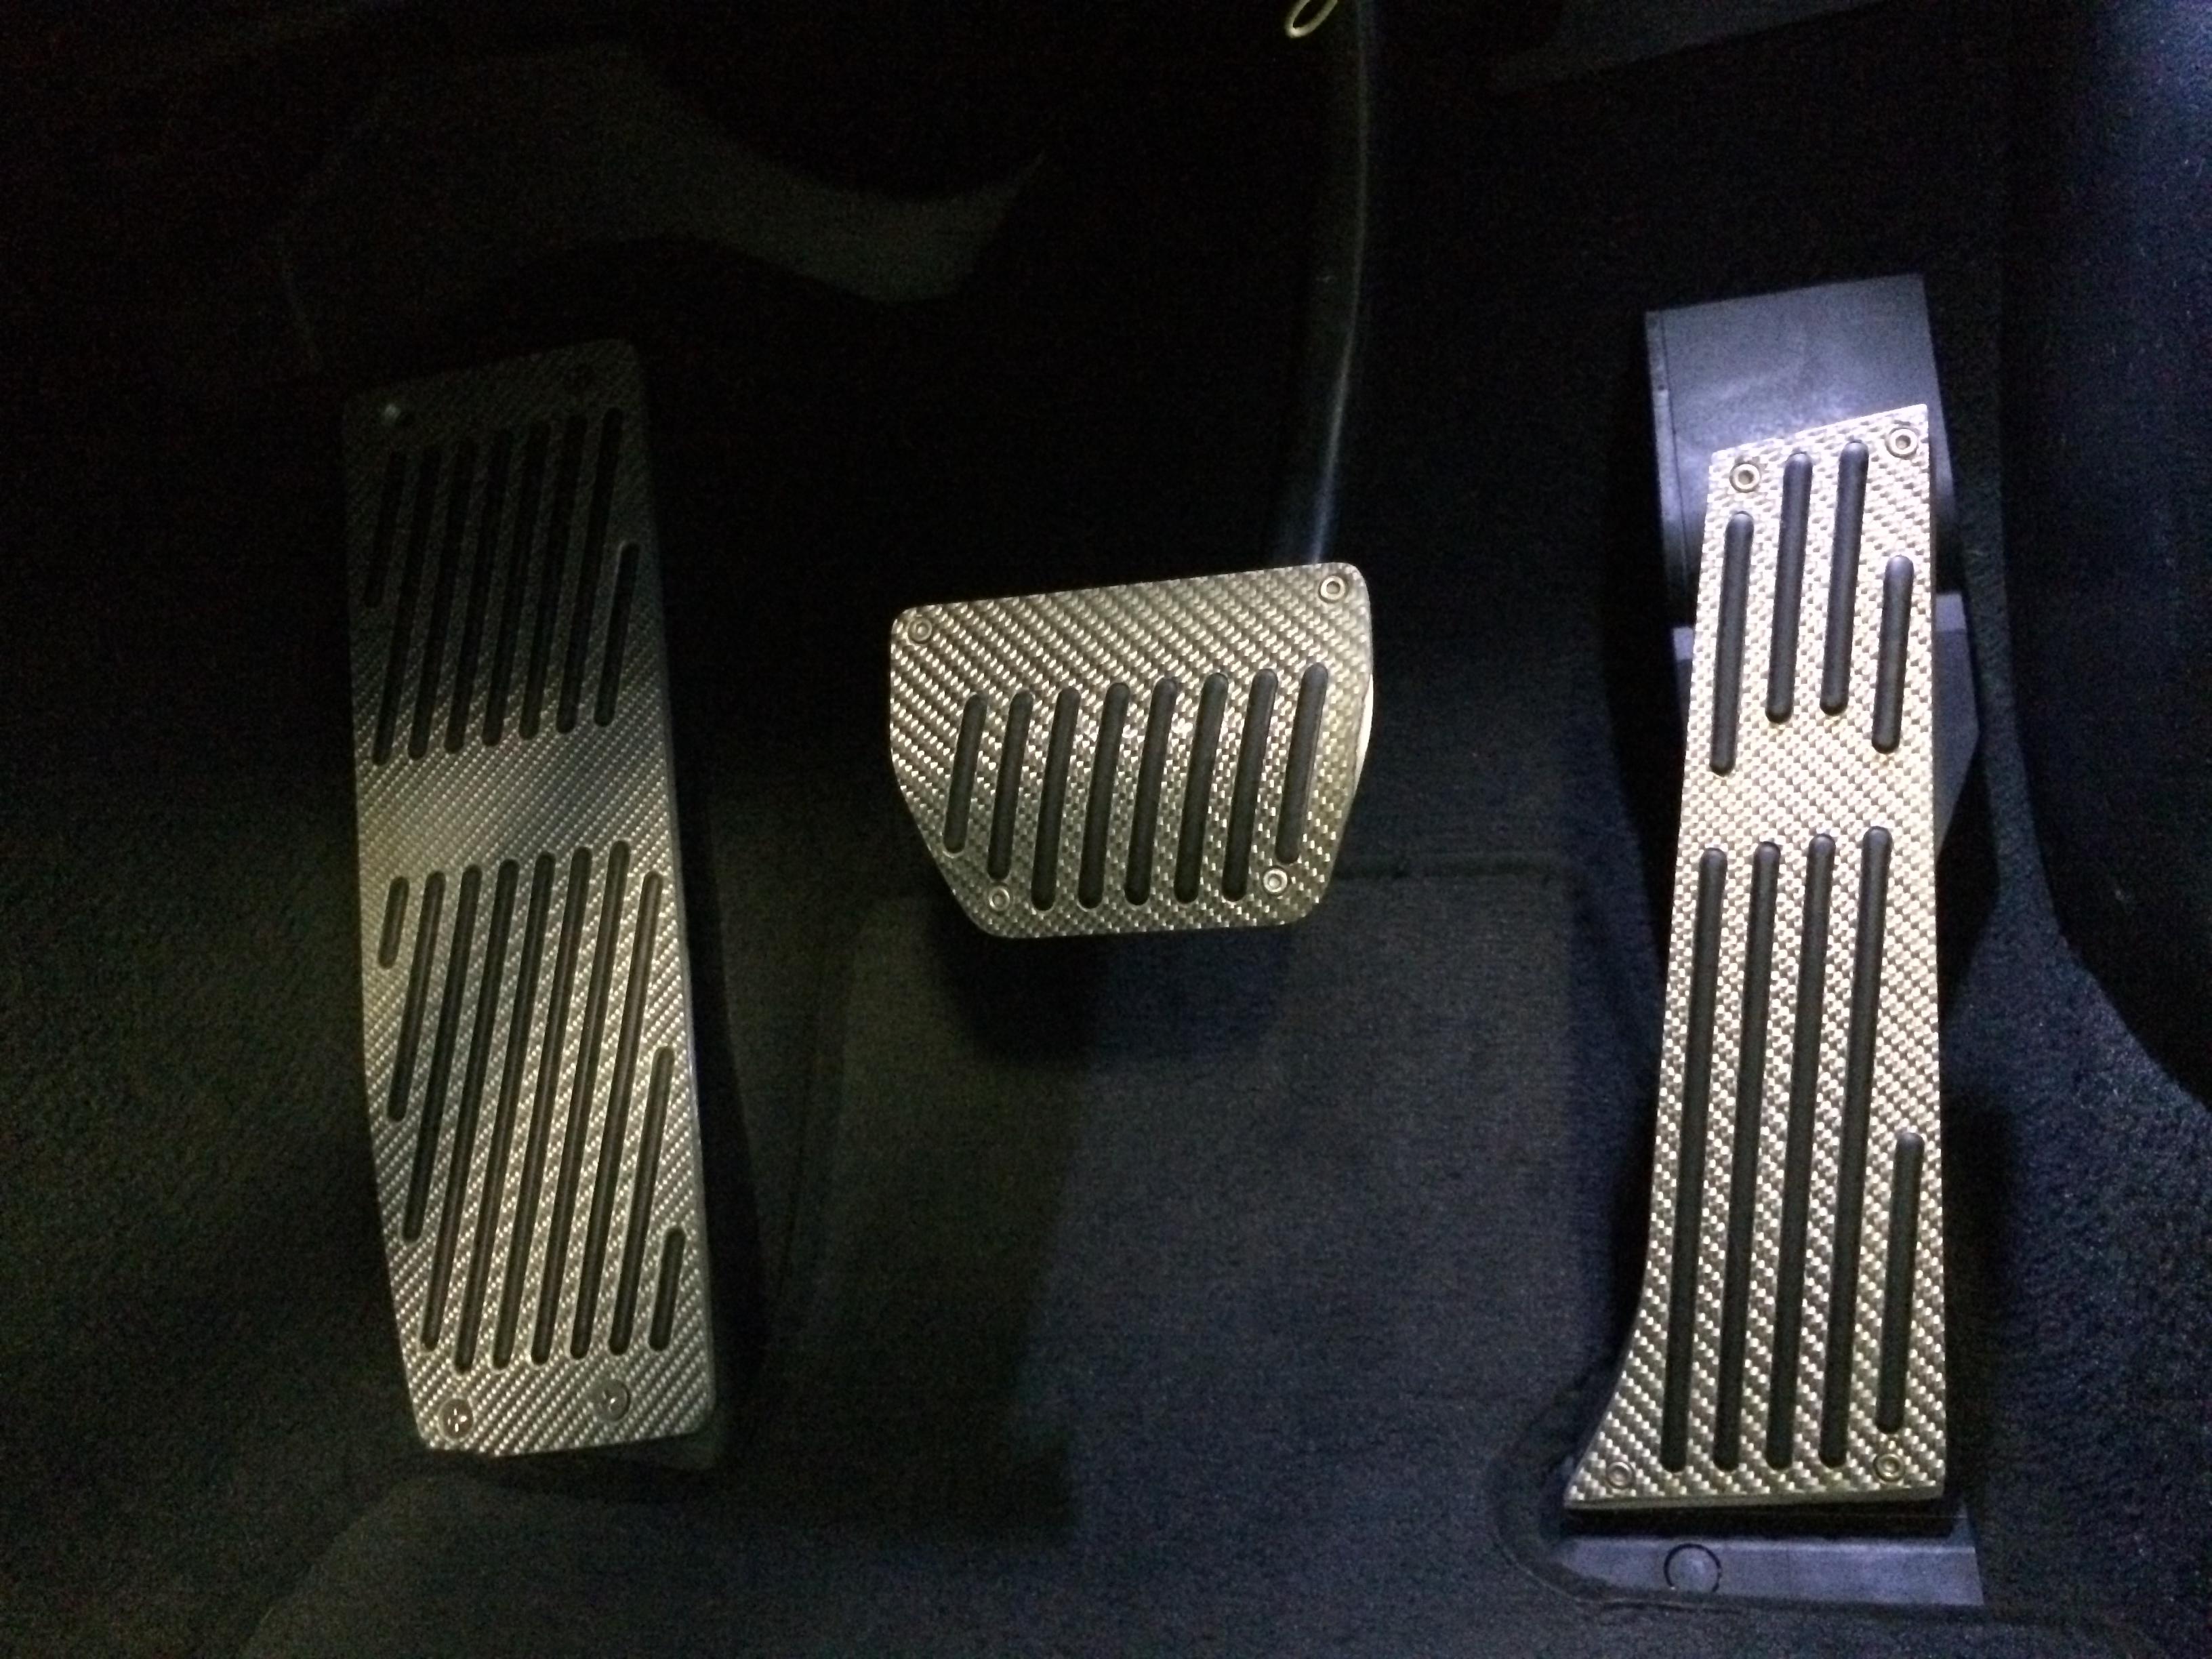 325i ハイラインBEAMコンプリートカーStⅡ アクティブステアリング コンビステア車両画像14